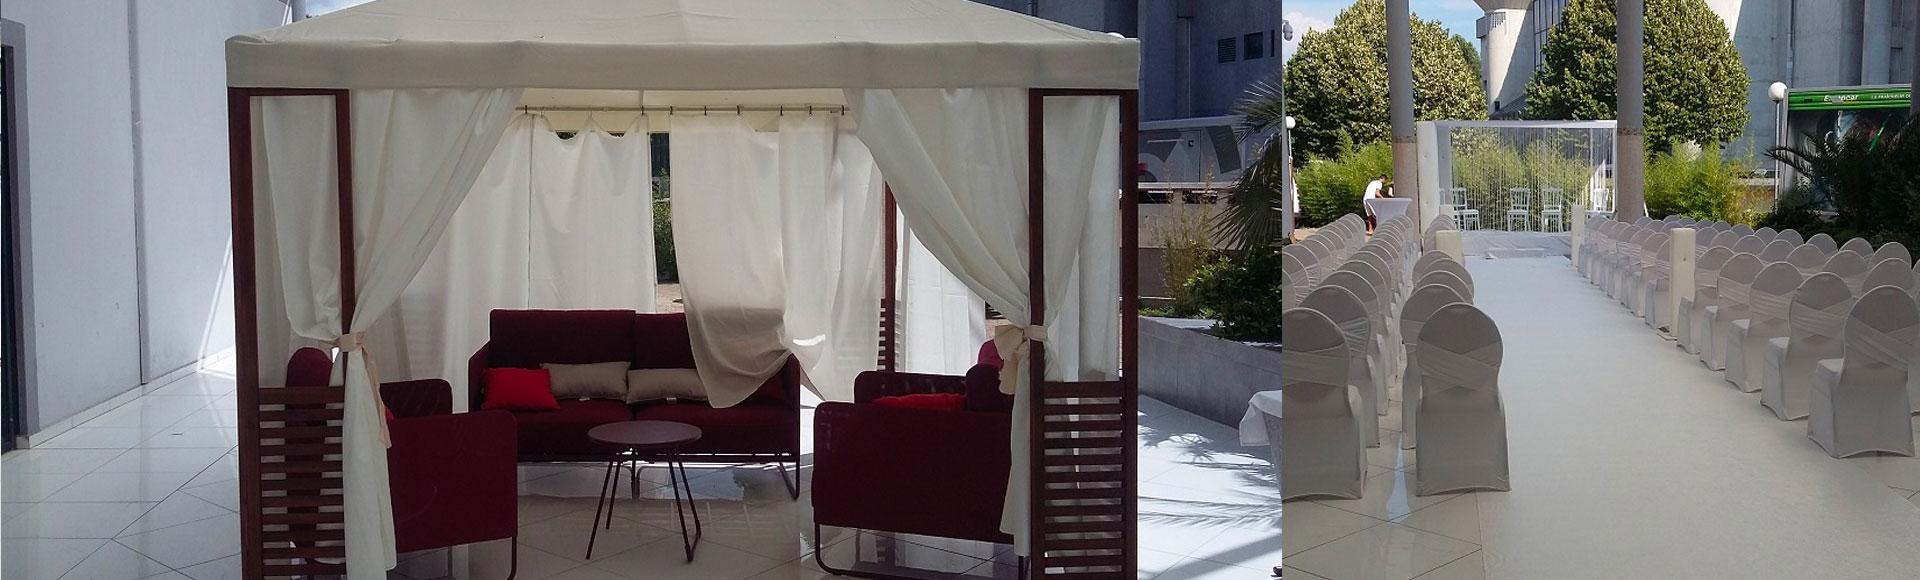 terrasse floriad palace marseille